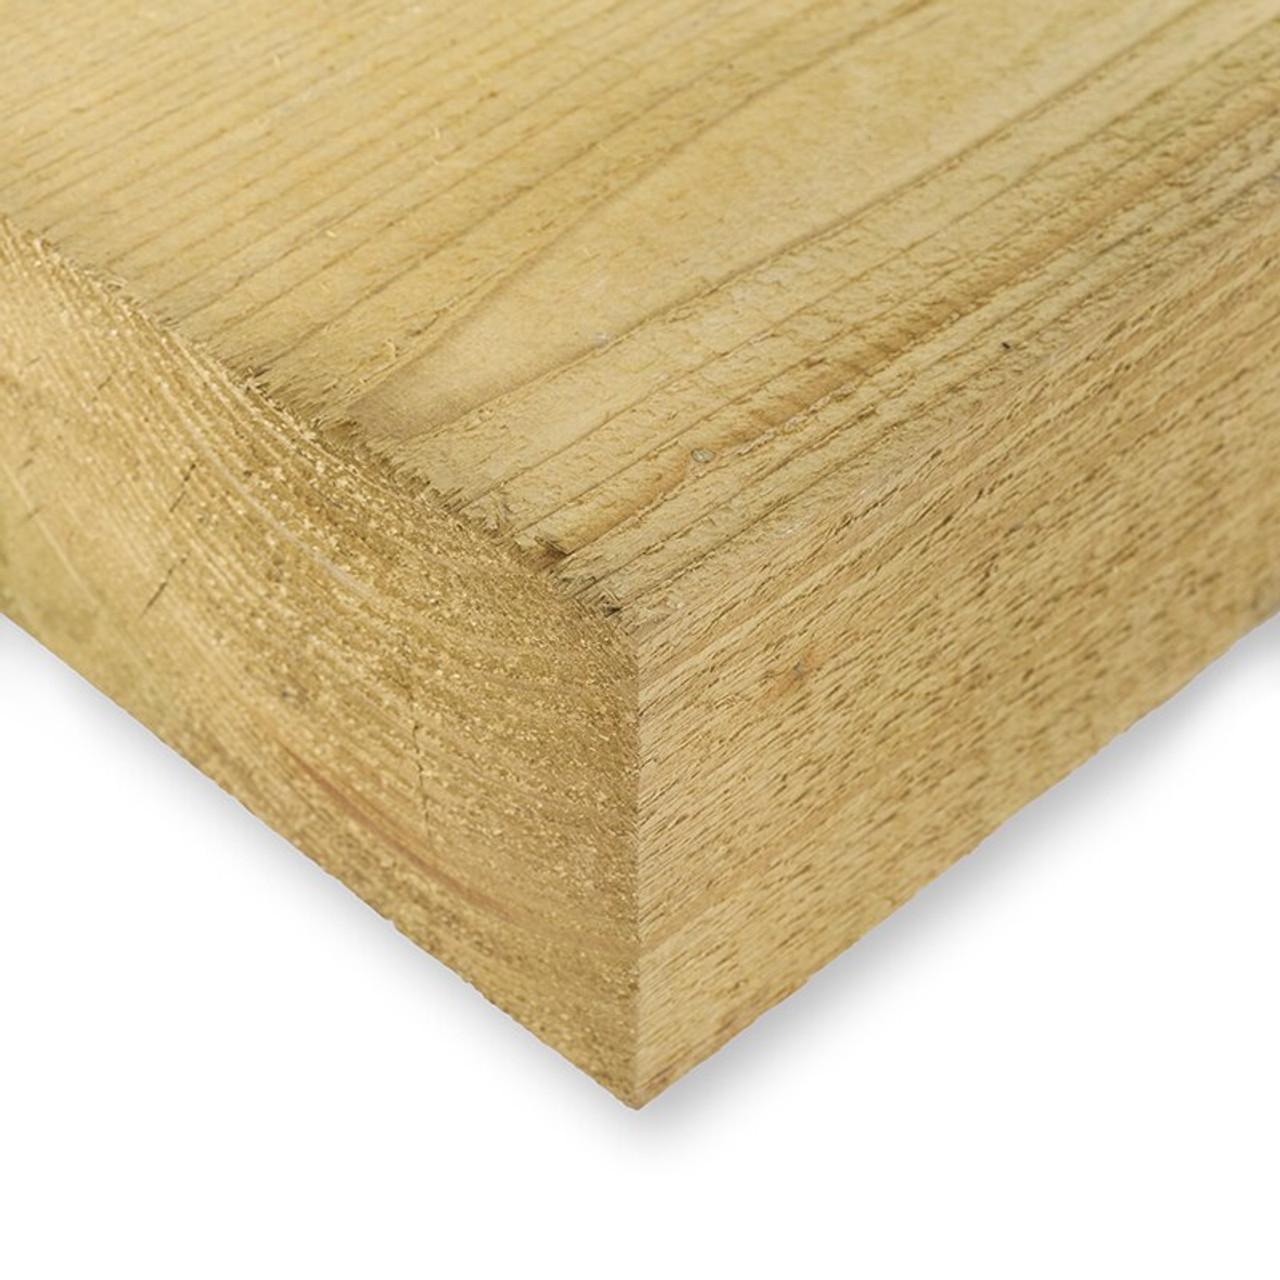 New Softwood Sleeper (2400 x 200 x 100mm) - Pressure Treated Natural Timber